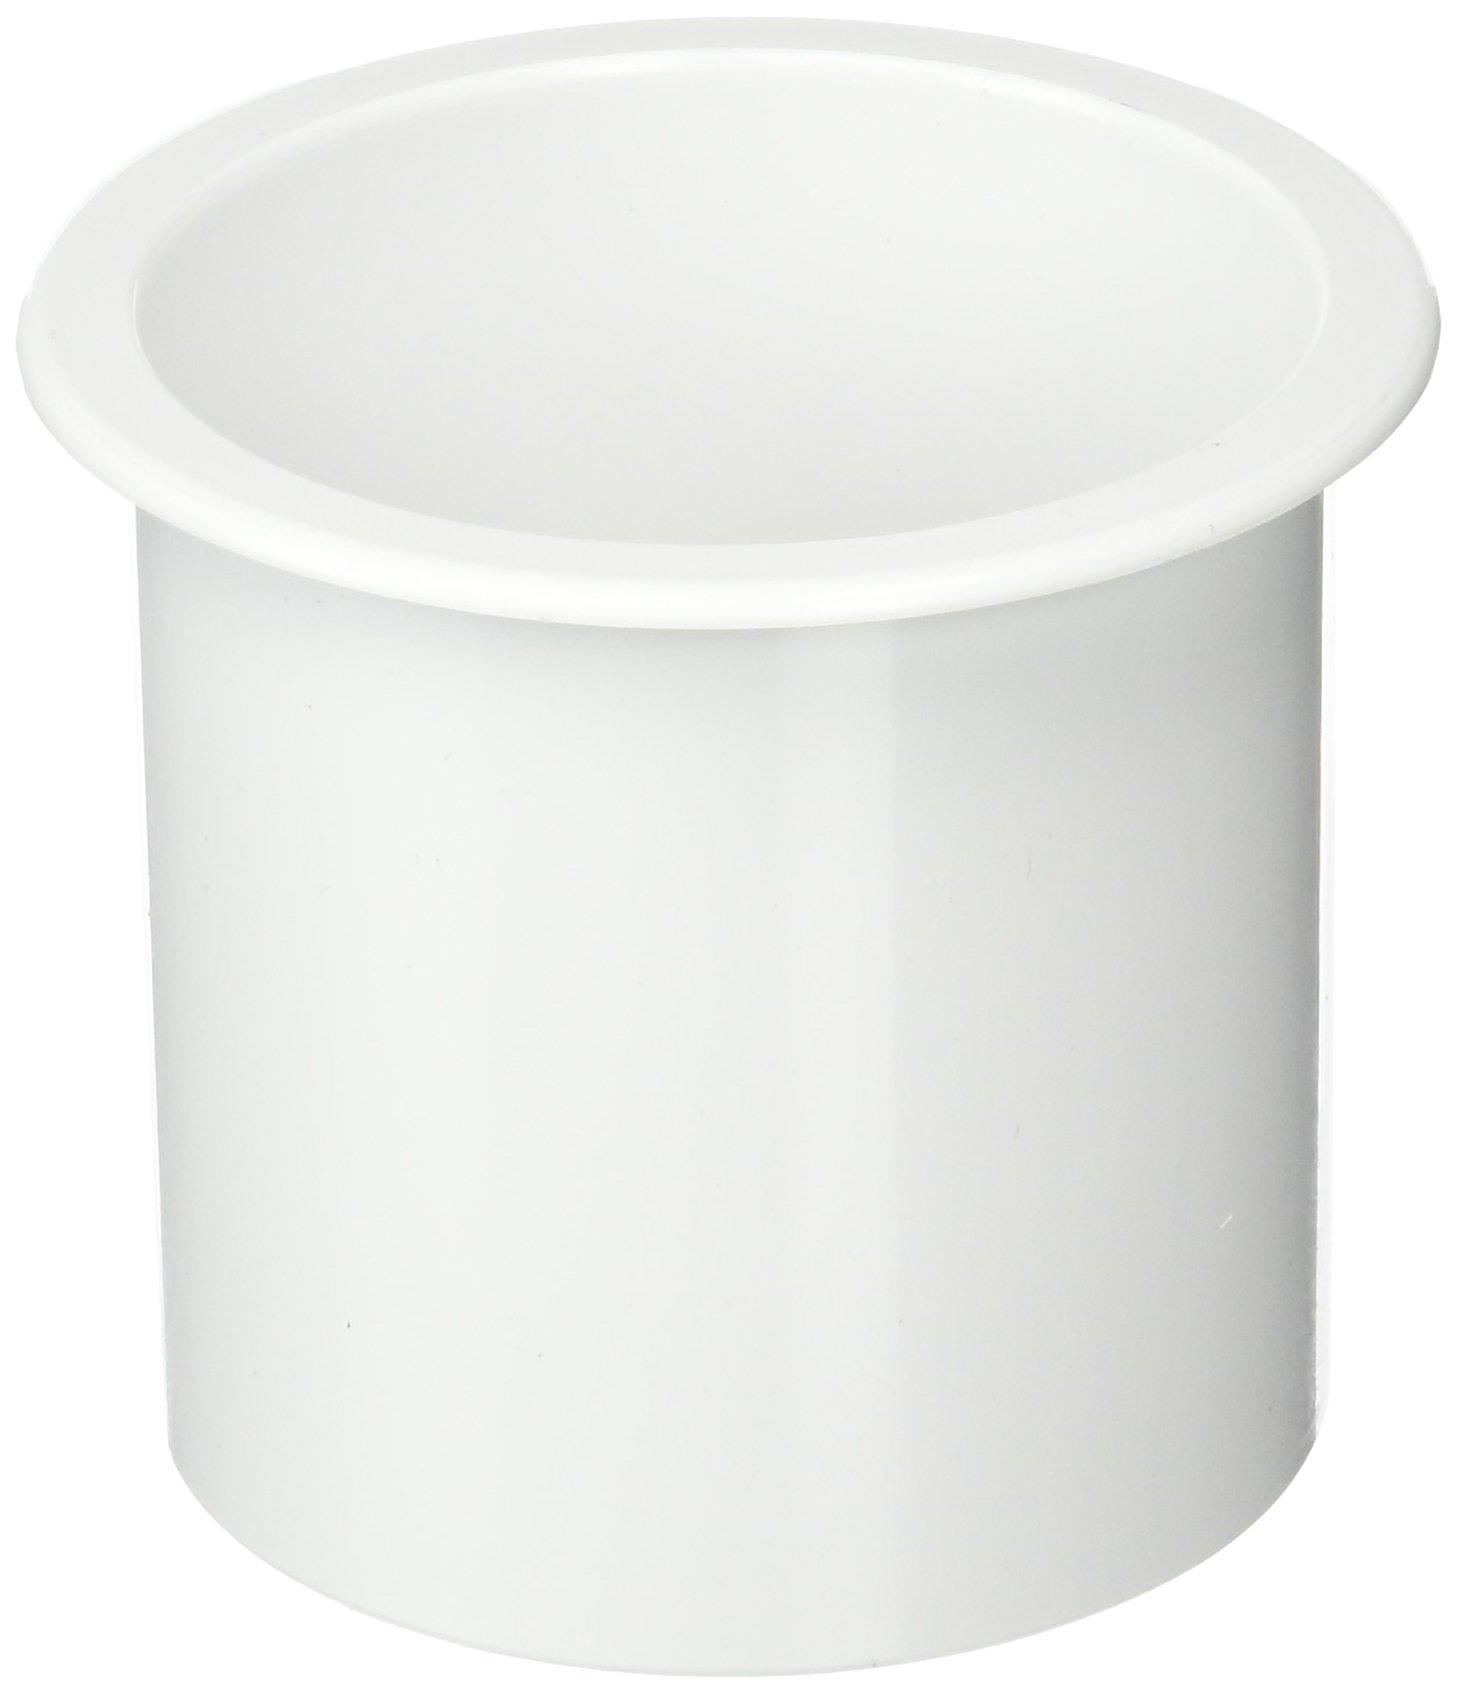 Sea-Dog 588011 Flush Mount Drink Holder, 3'' Deep - White